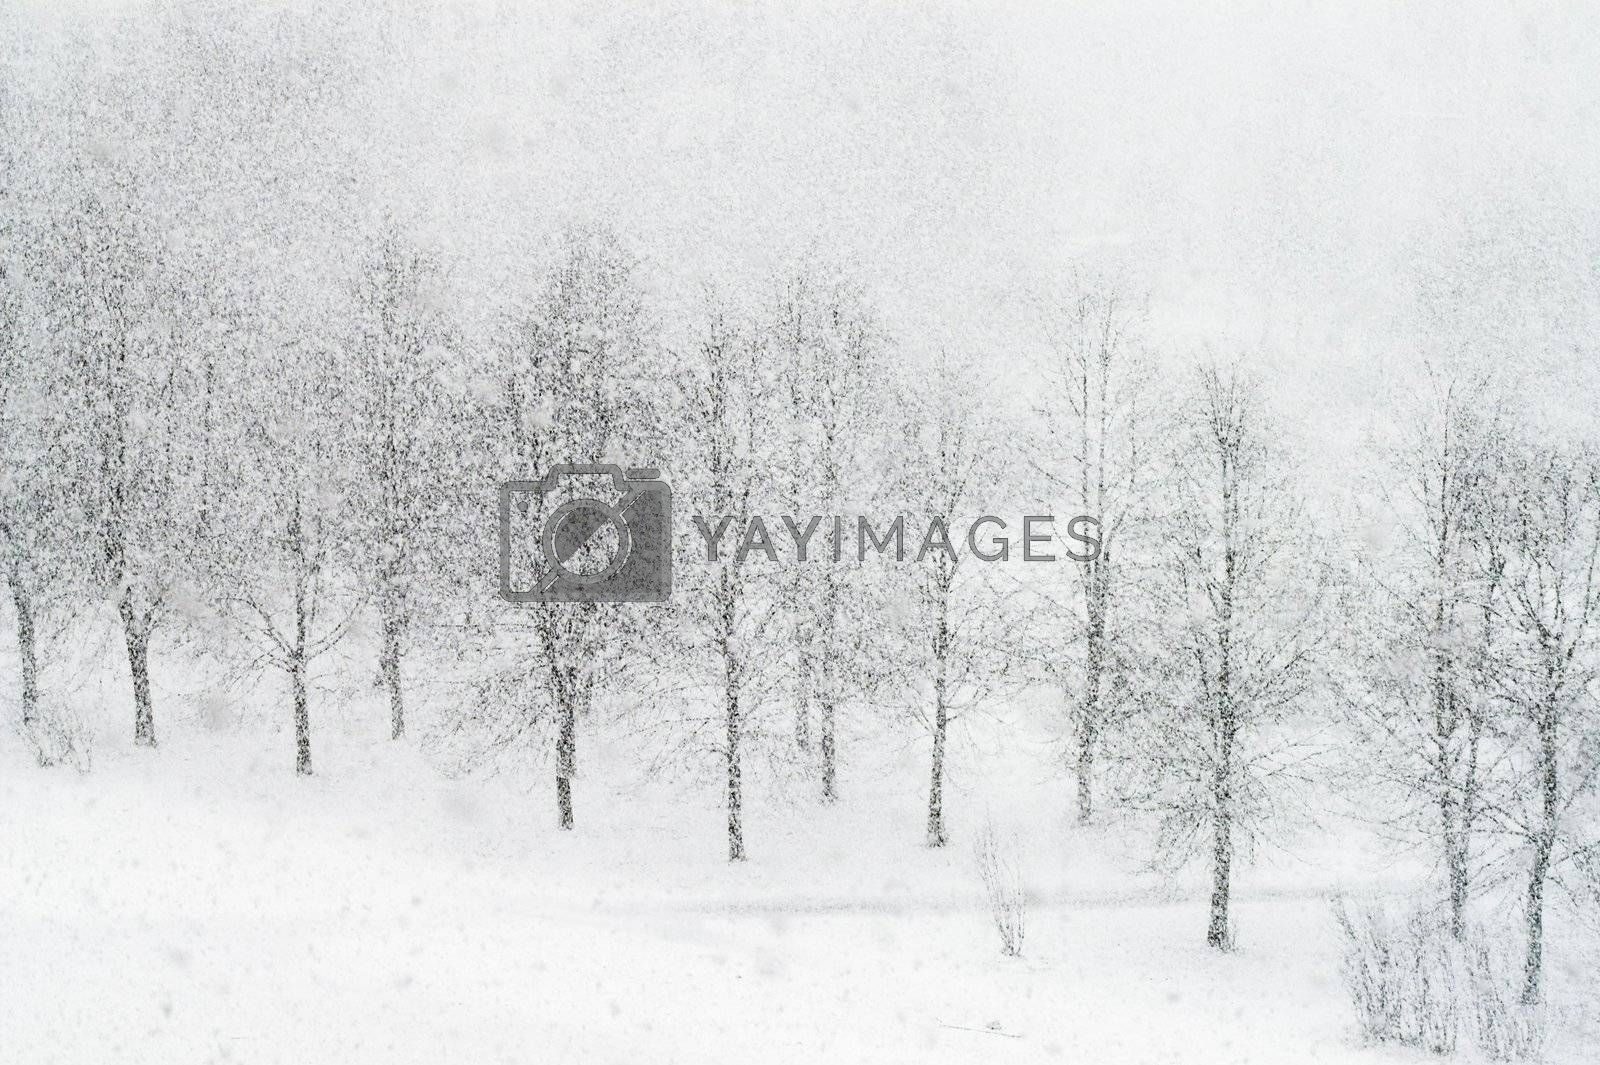 Heavy snowfalling in city park